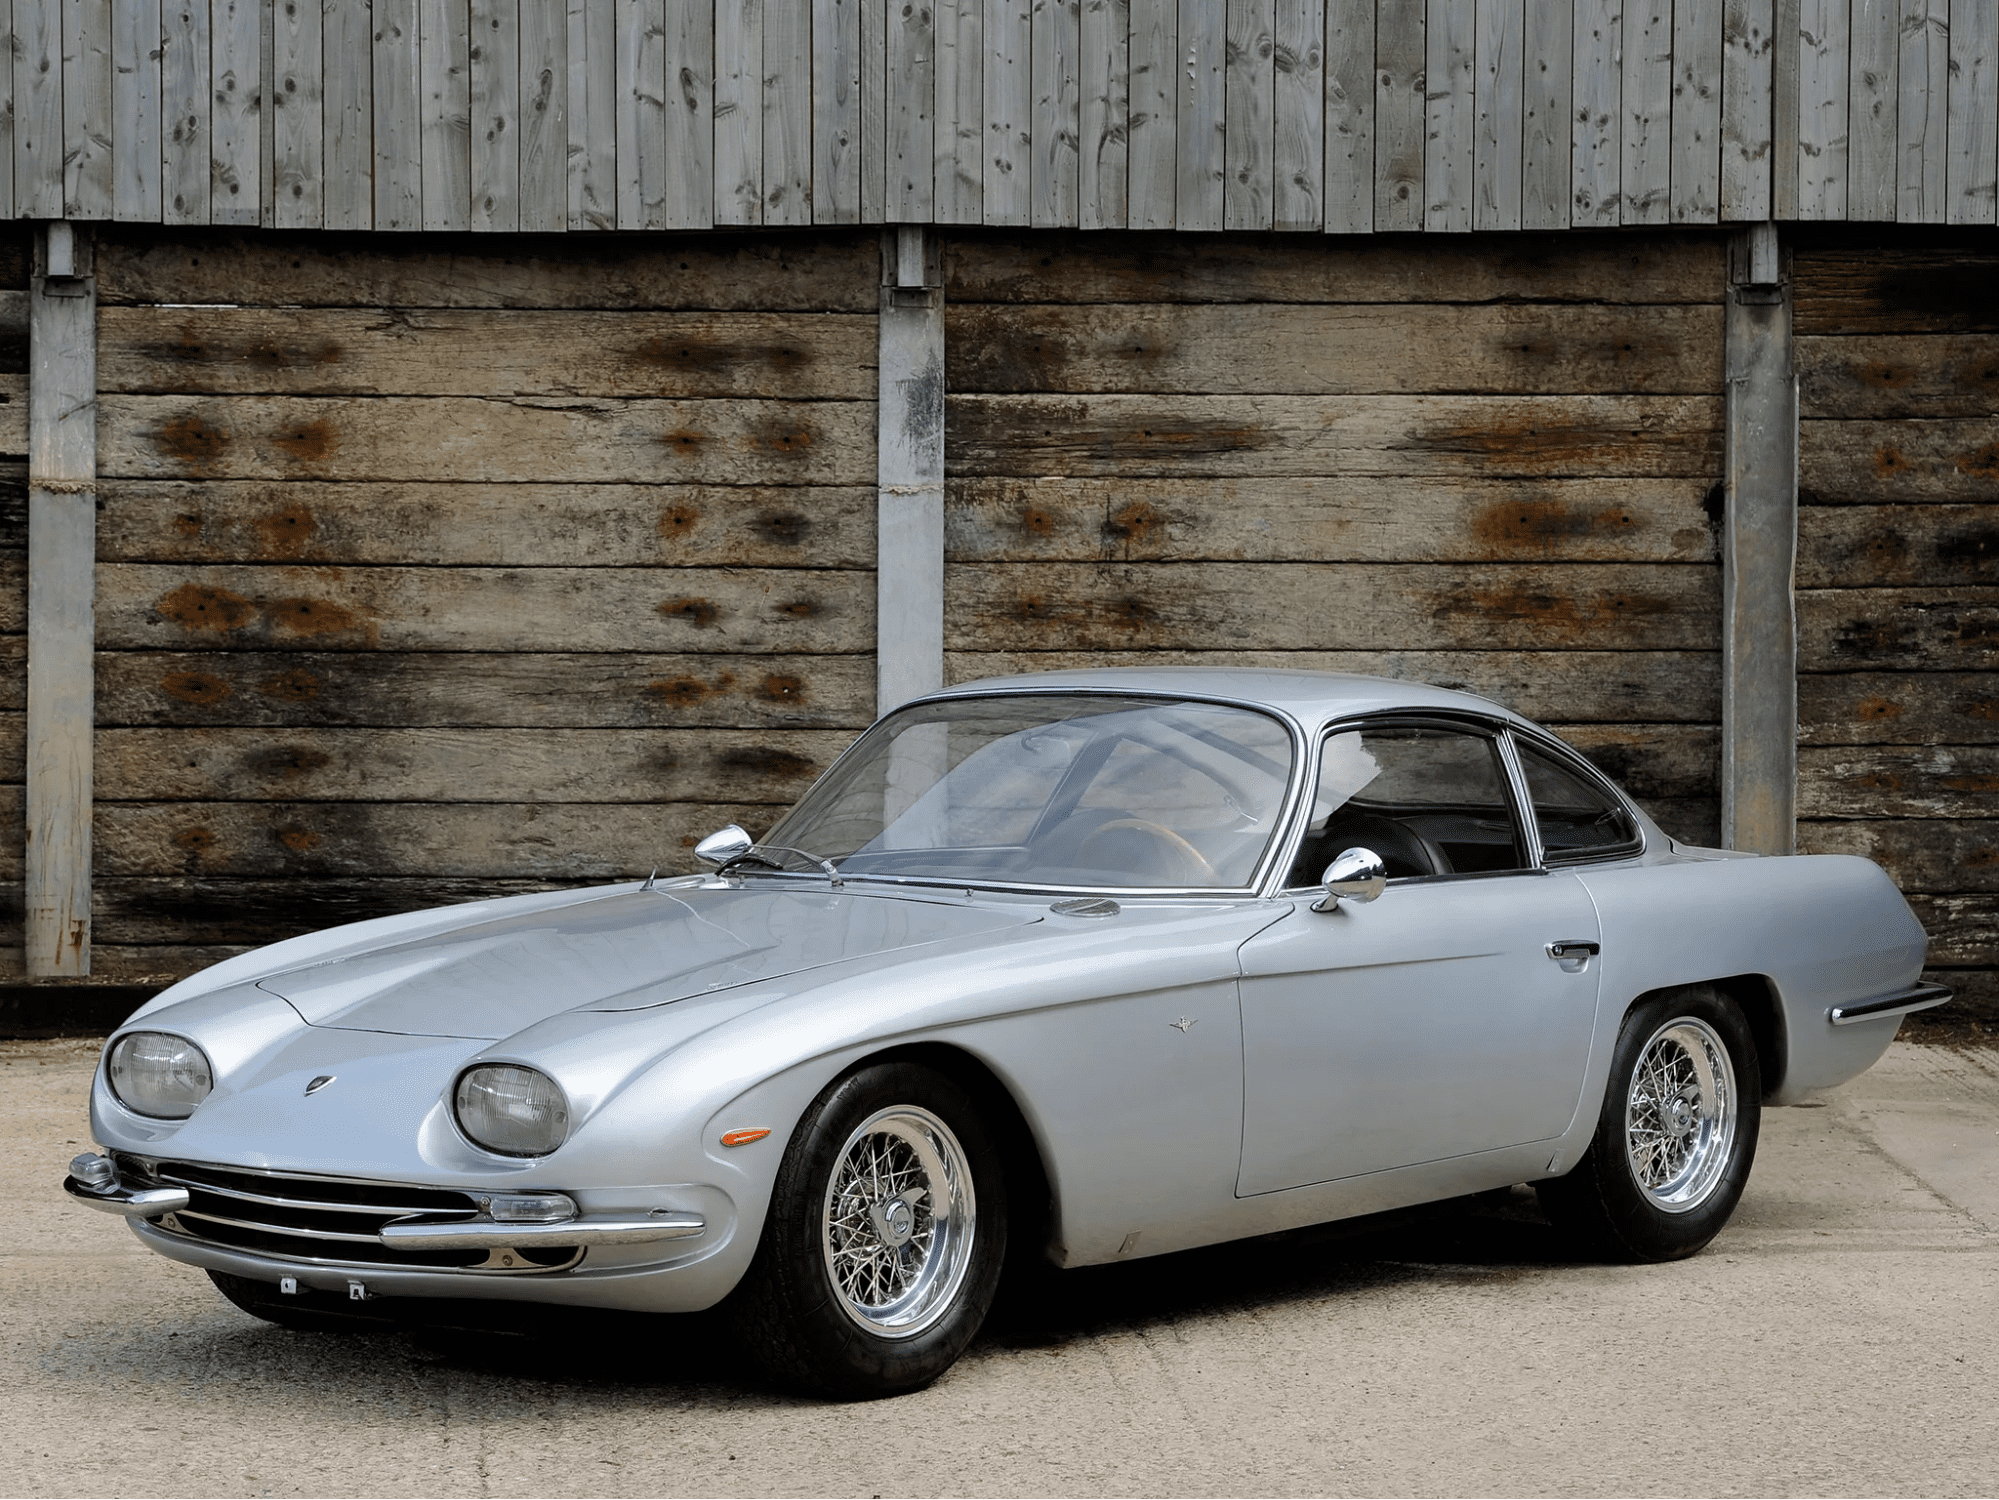 Так выглядела сама первая Lamborghini.